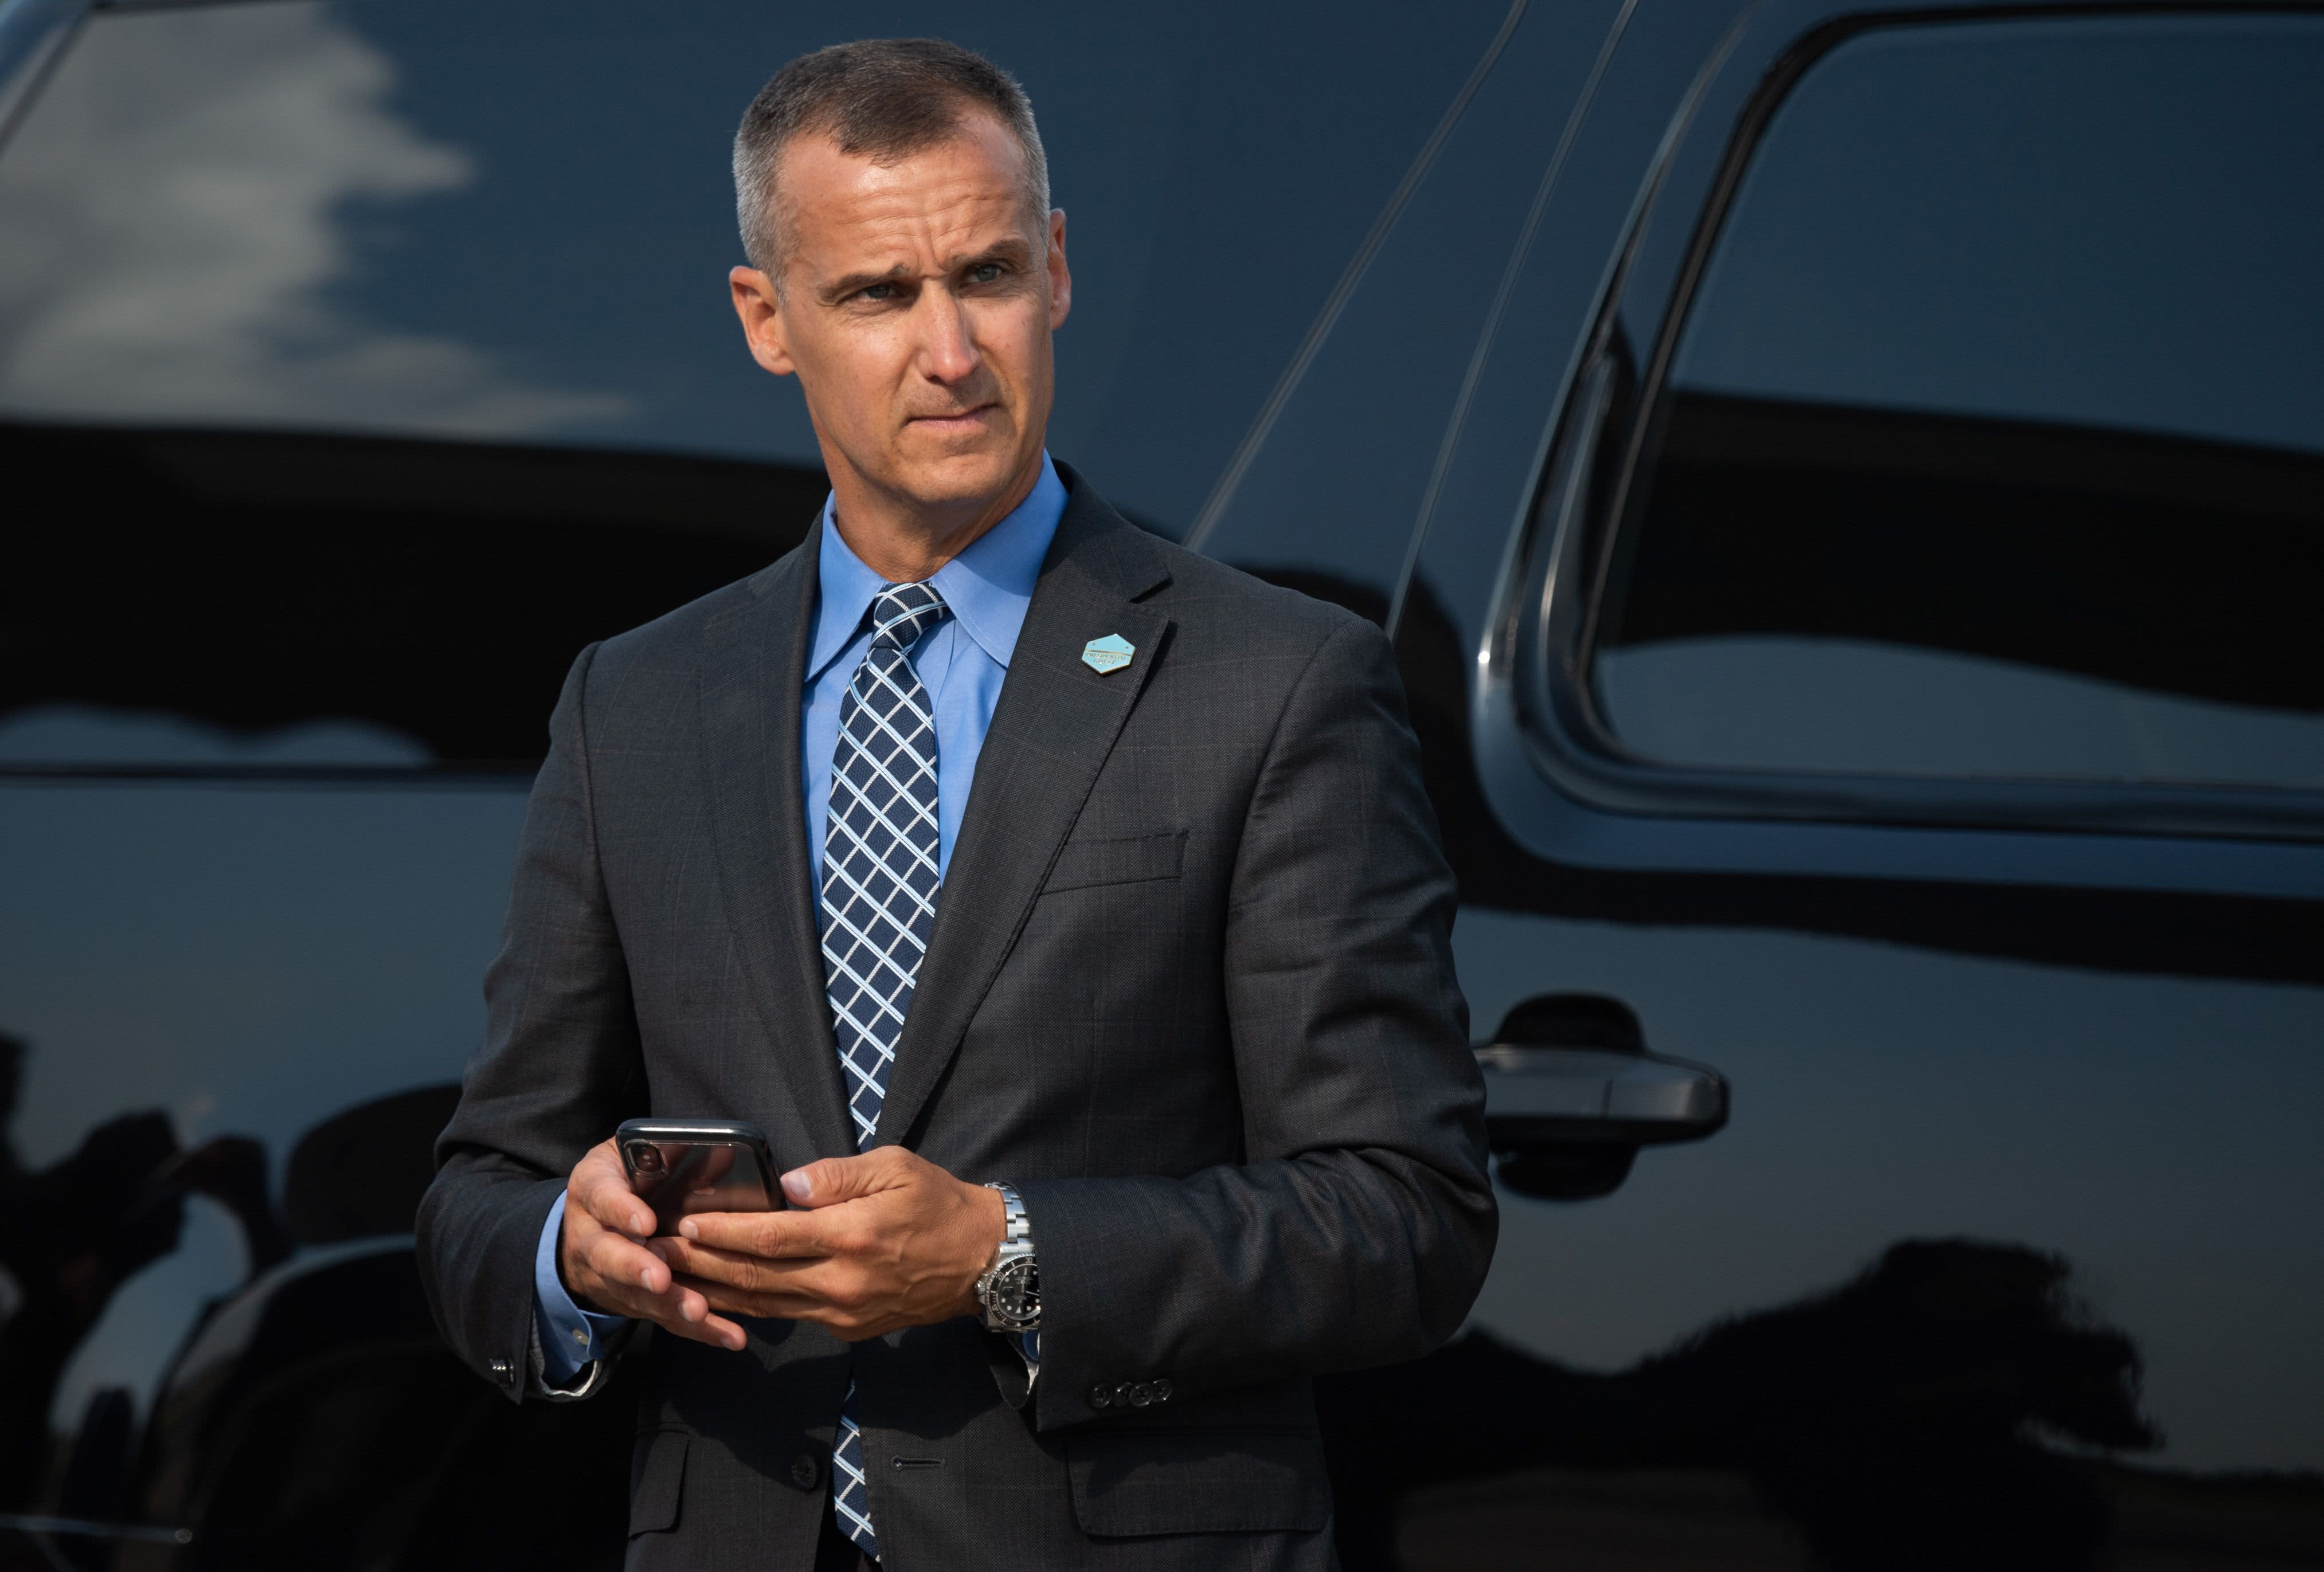 Ex-Trump campaign manager Corey Lewandowski subpoenaed by Dems as he hints at Senate run